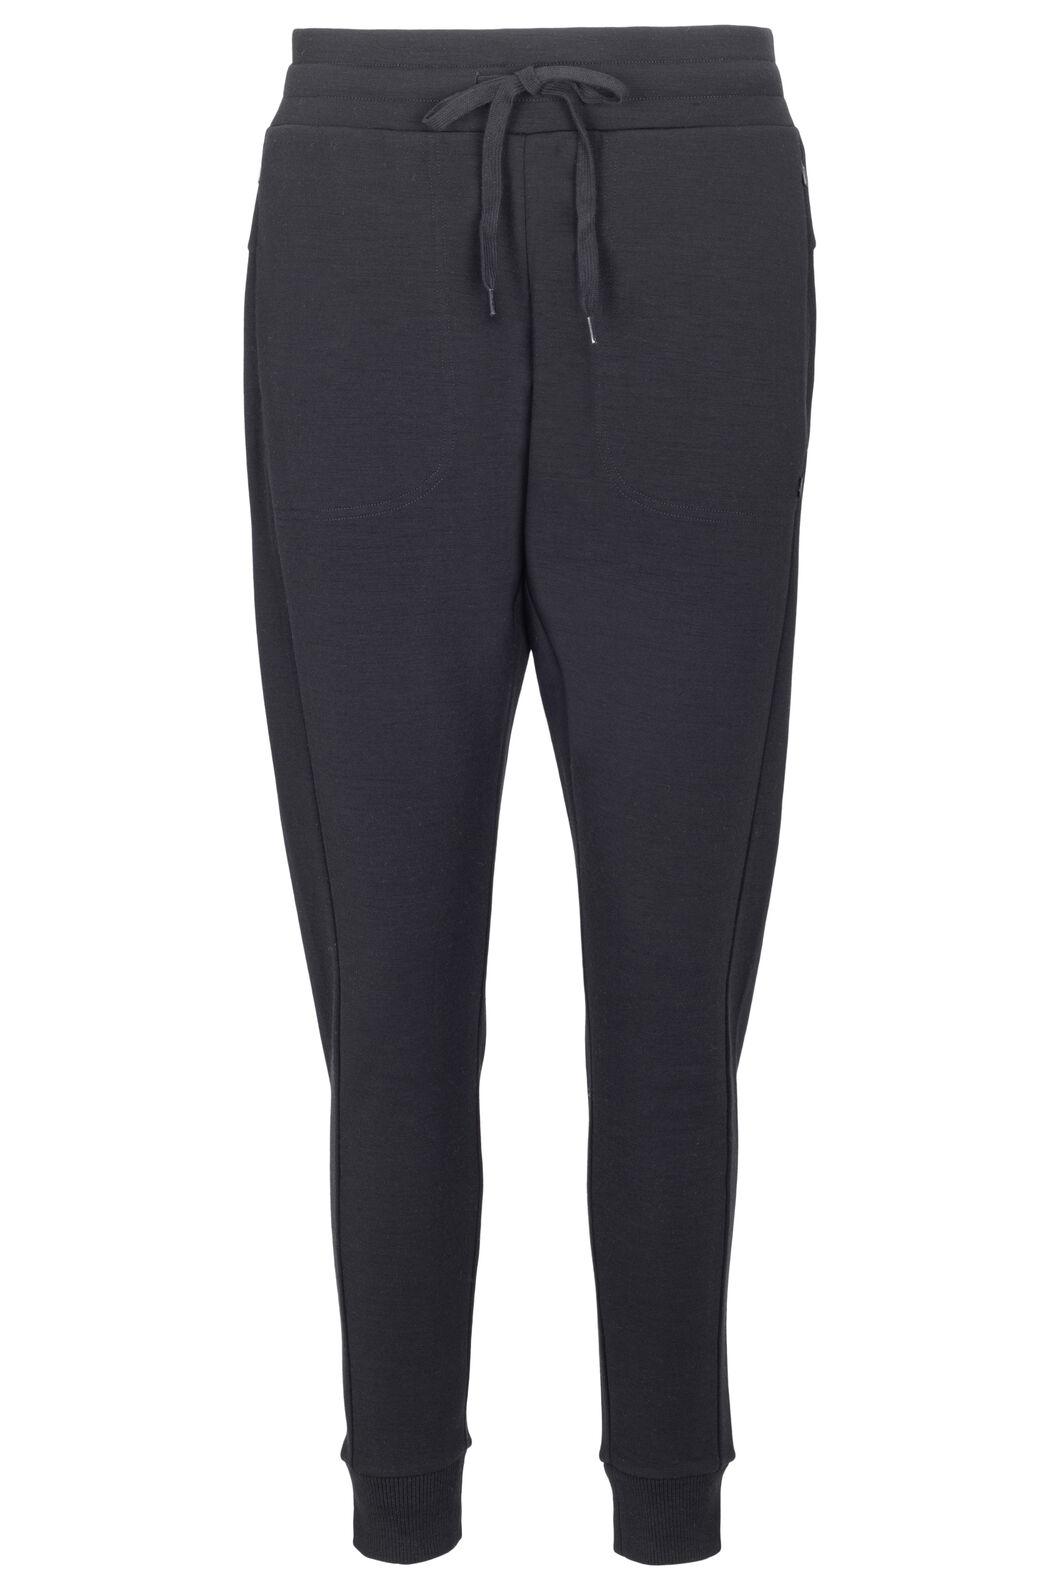 Macpac Women's Merino Blend Track Pants, Black, hi-res